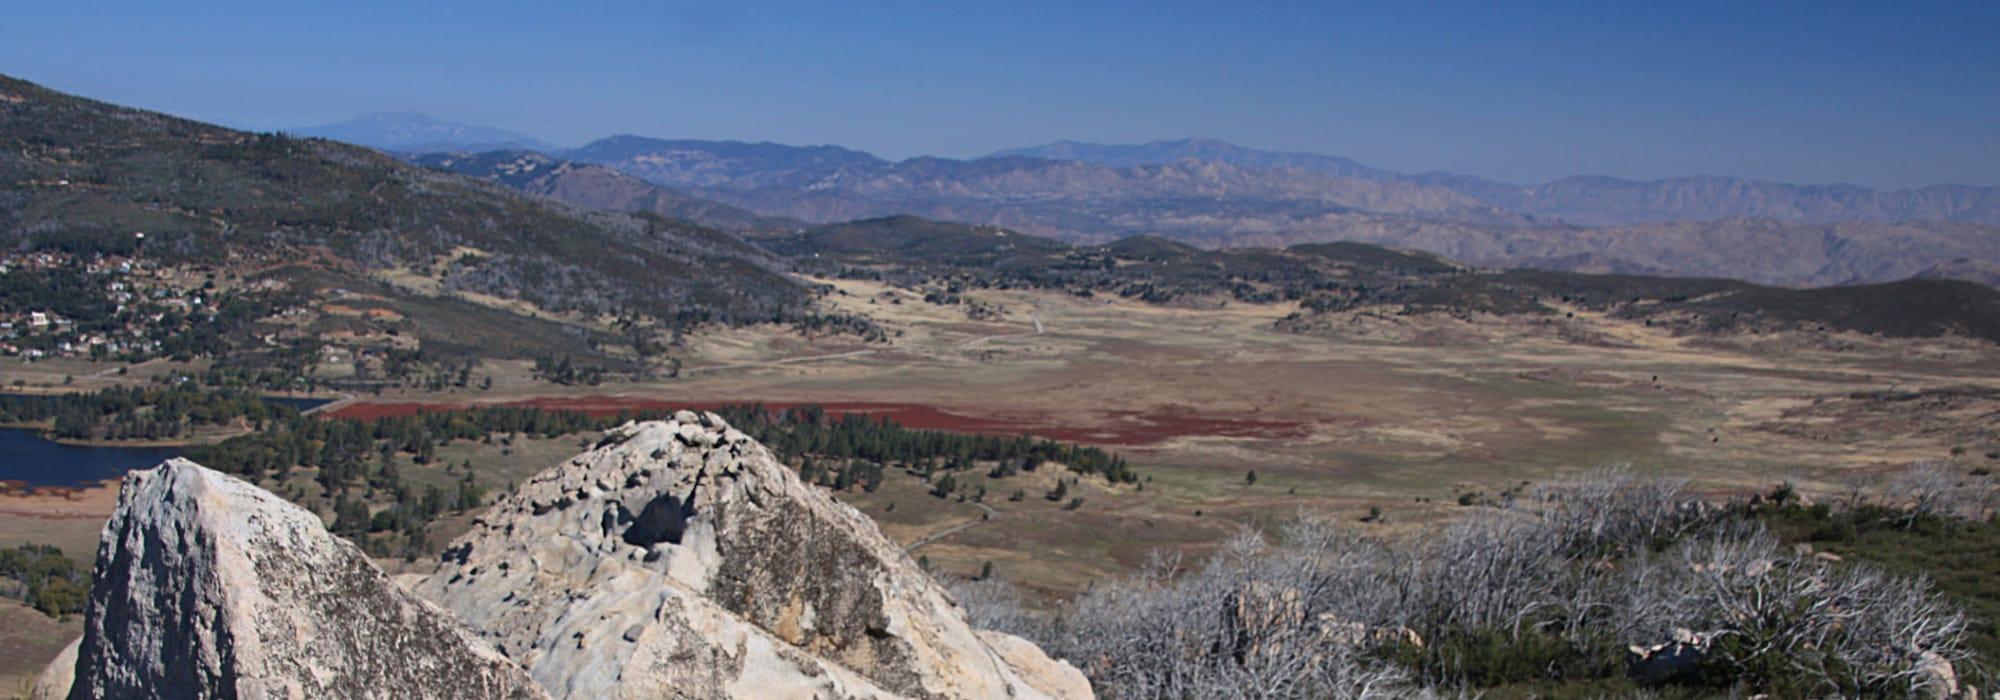 Cuyamaca Rancho State Park near Jamacha Point Self Storage in Spring Valley, California